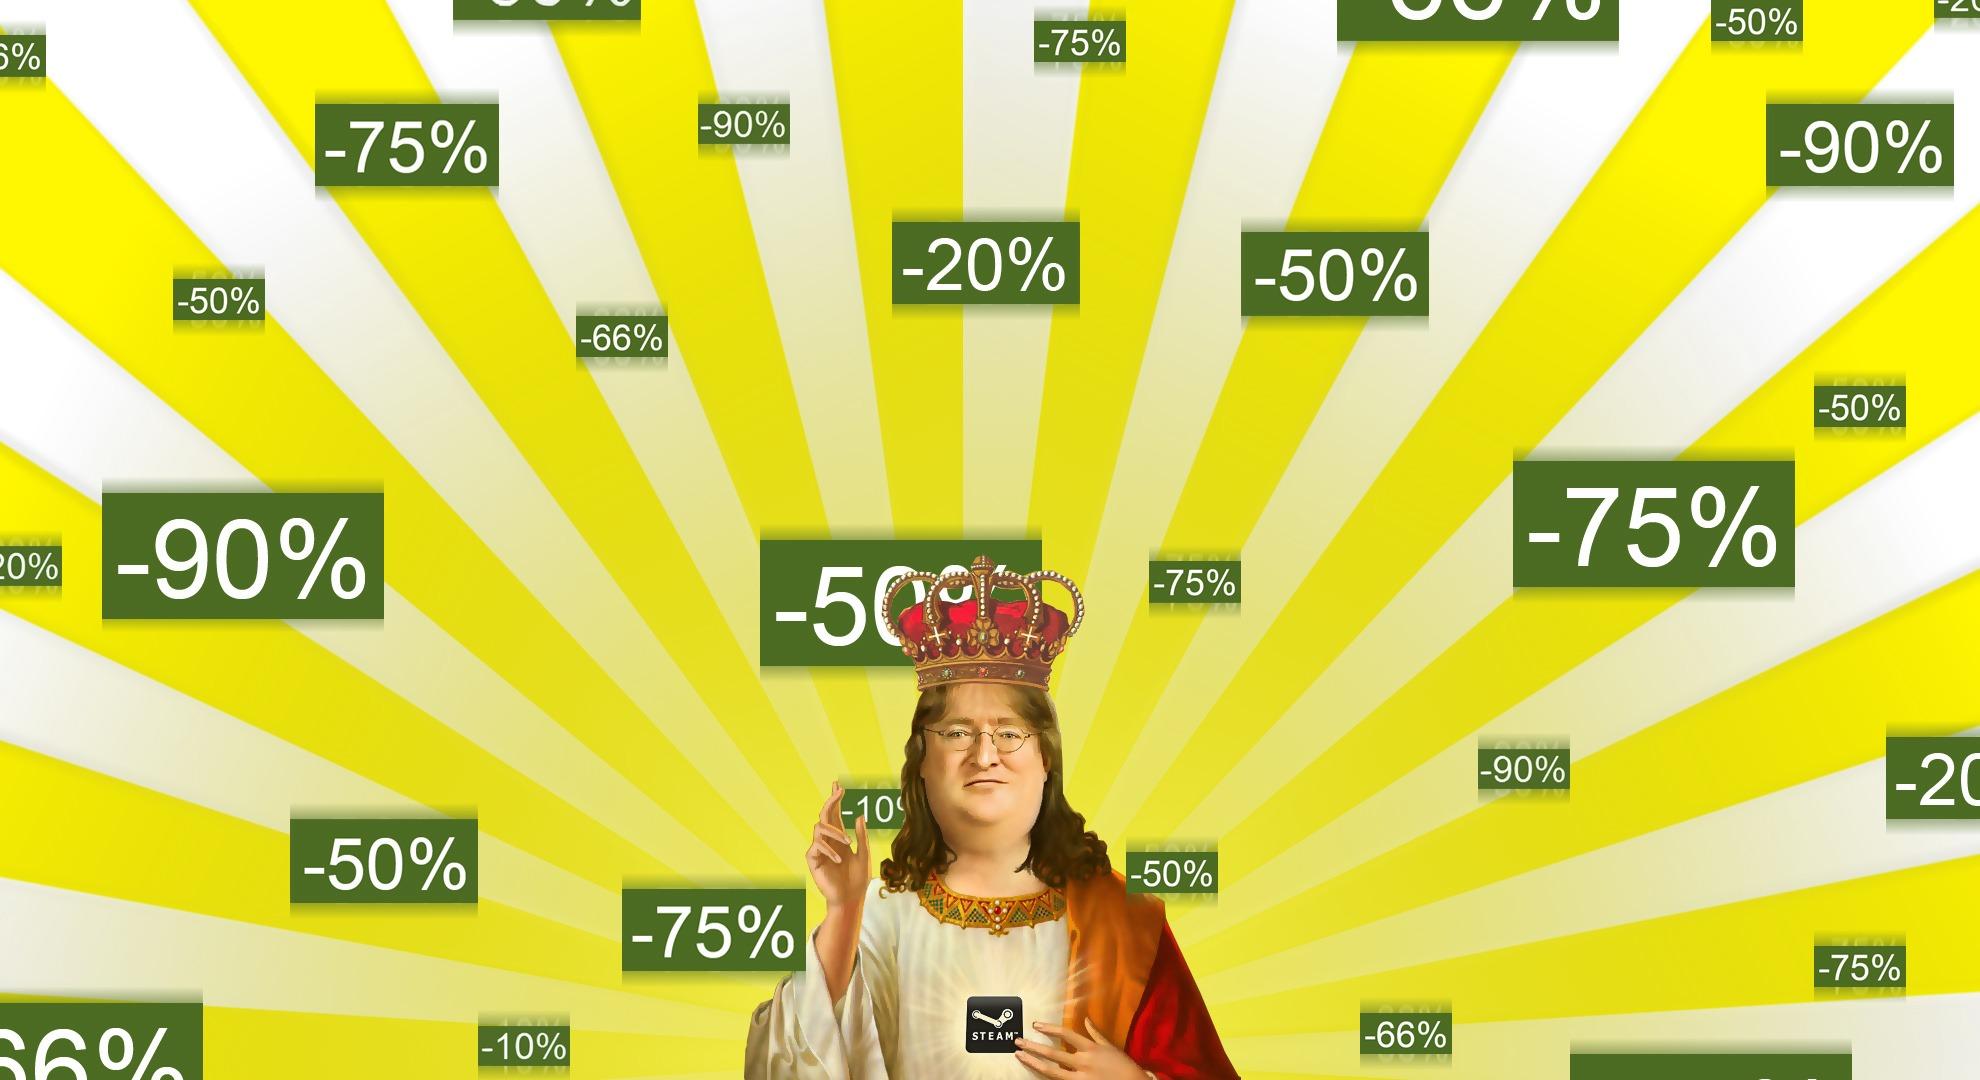 ec70efc9e1fe Steam Summer Sale 2017 Space Game Deals Guide | Space Game Junkie